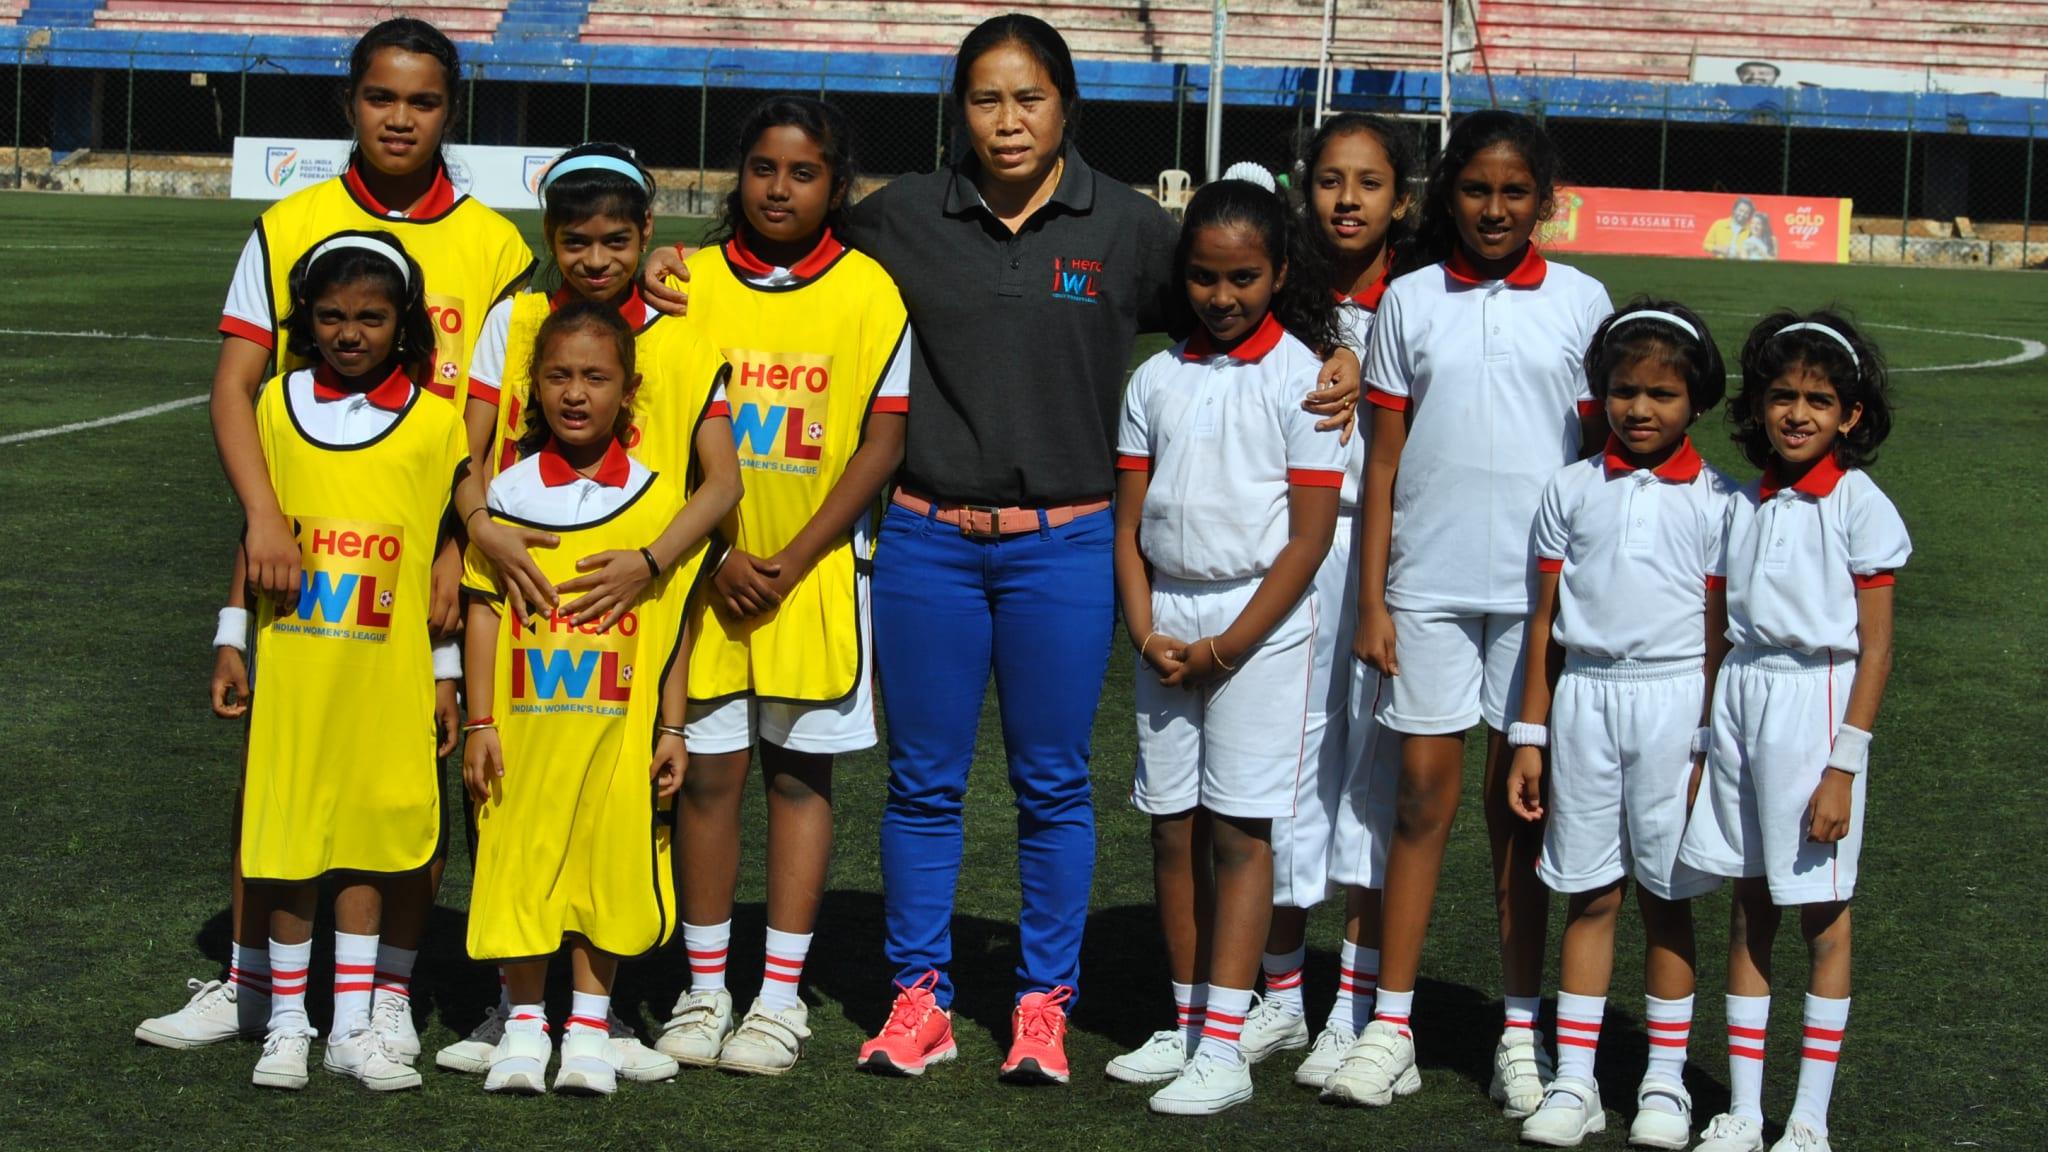 Oinam Bembem Devi trainiert Kinder in Indien